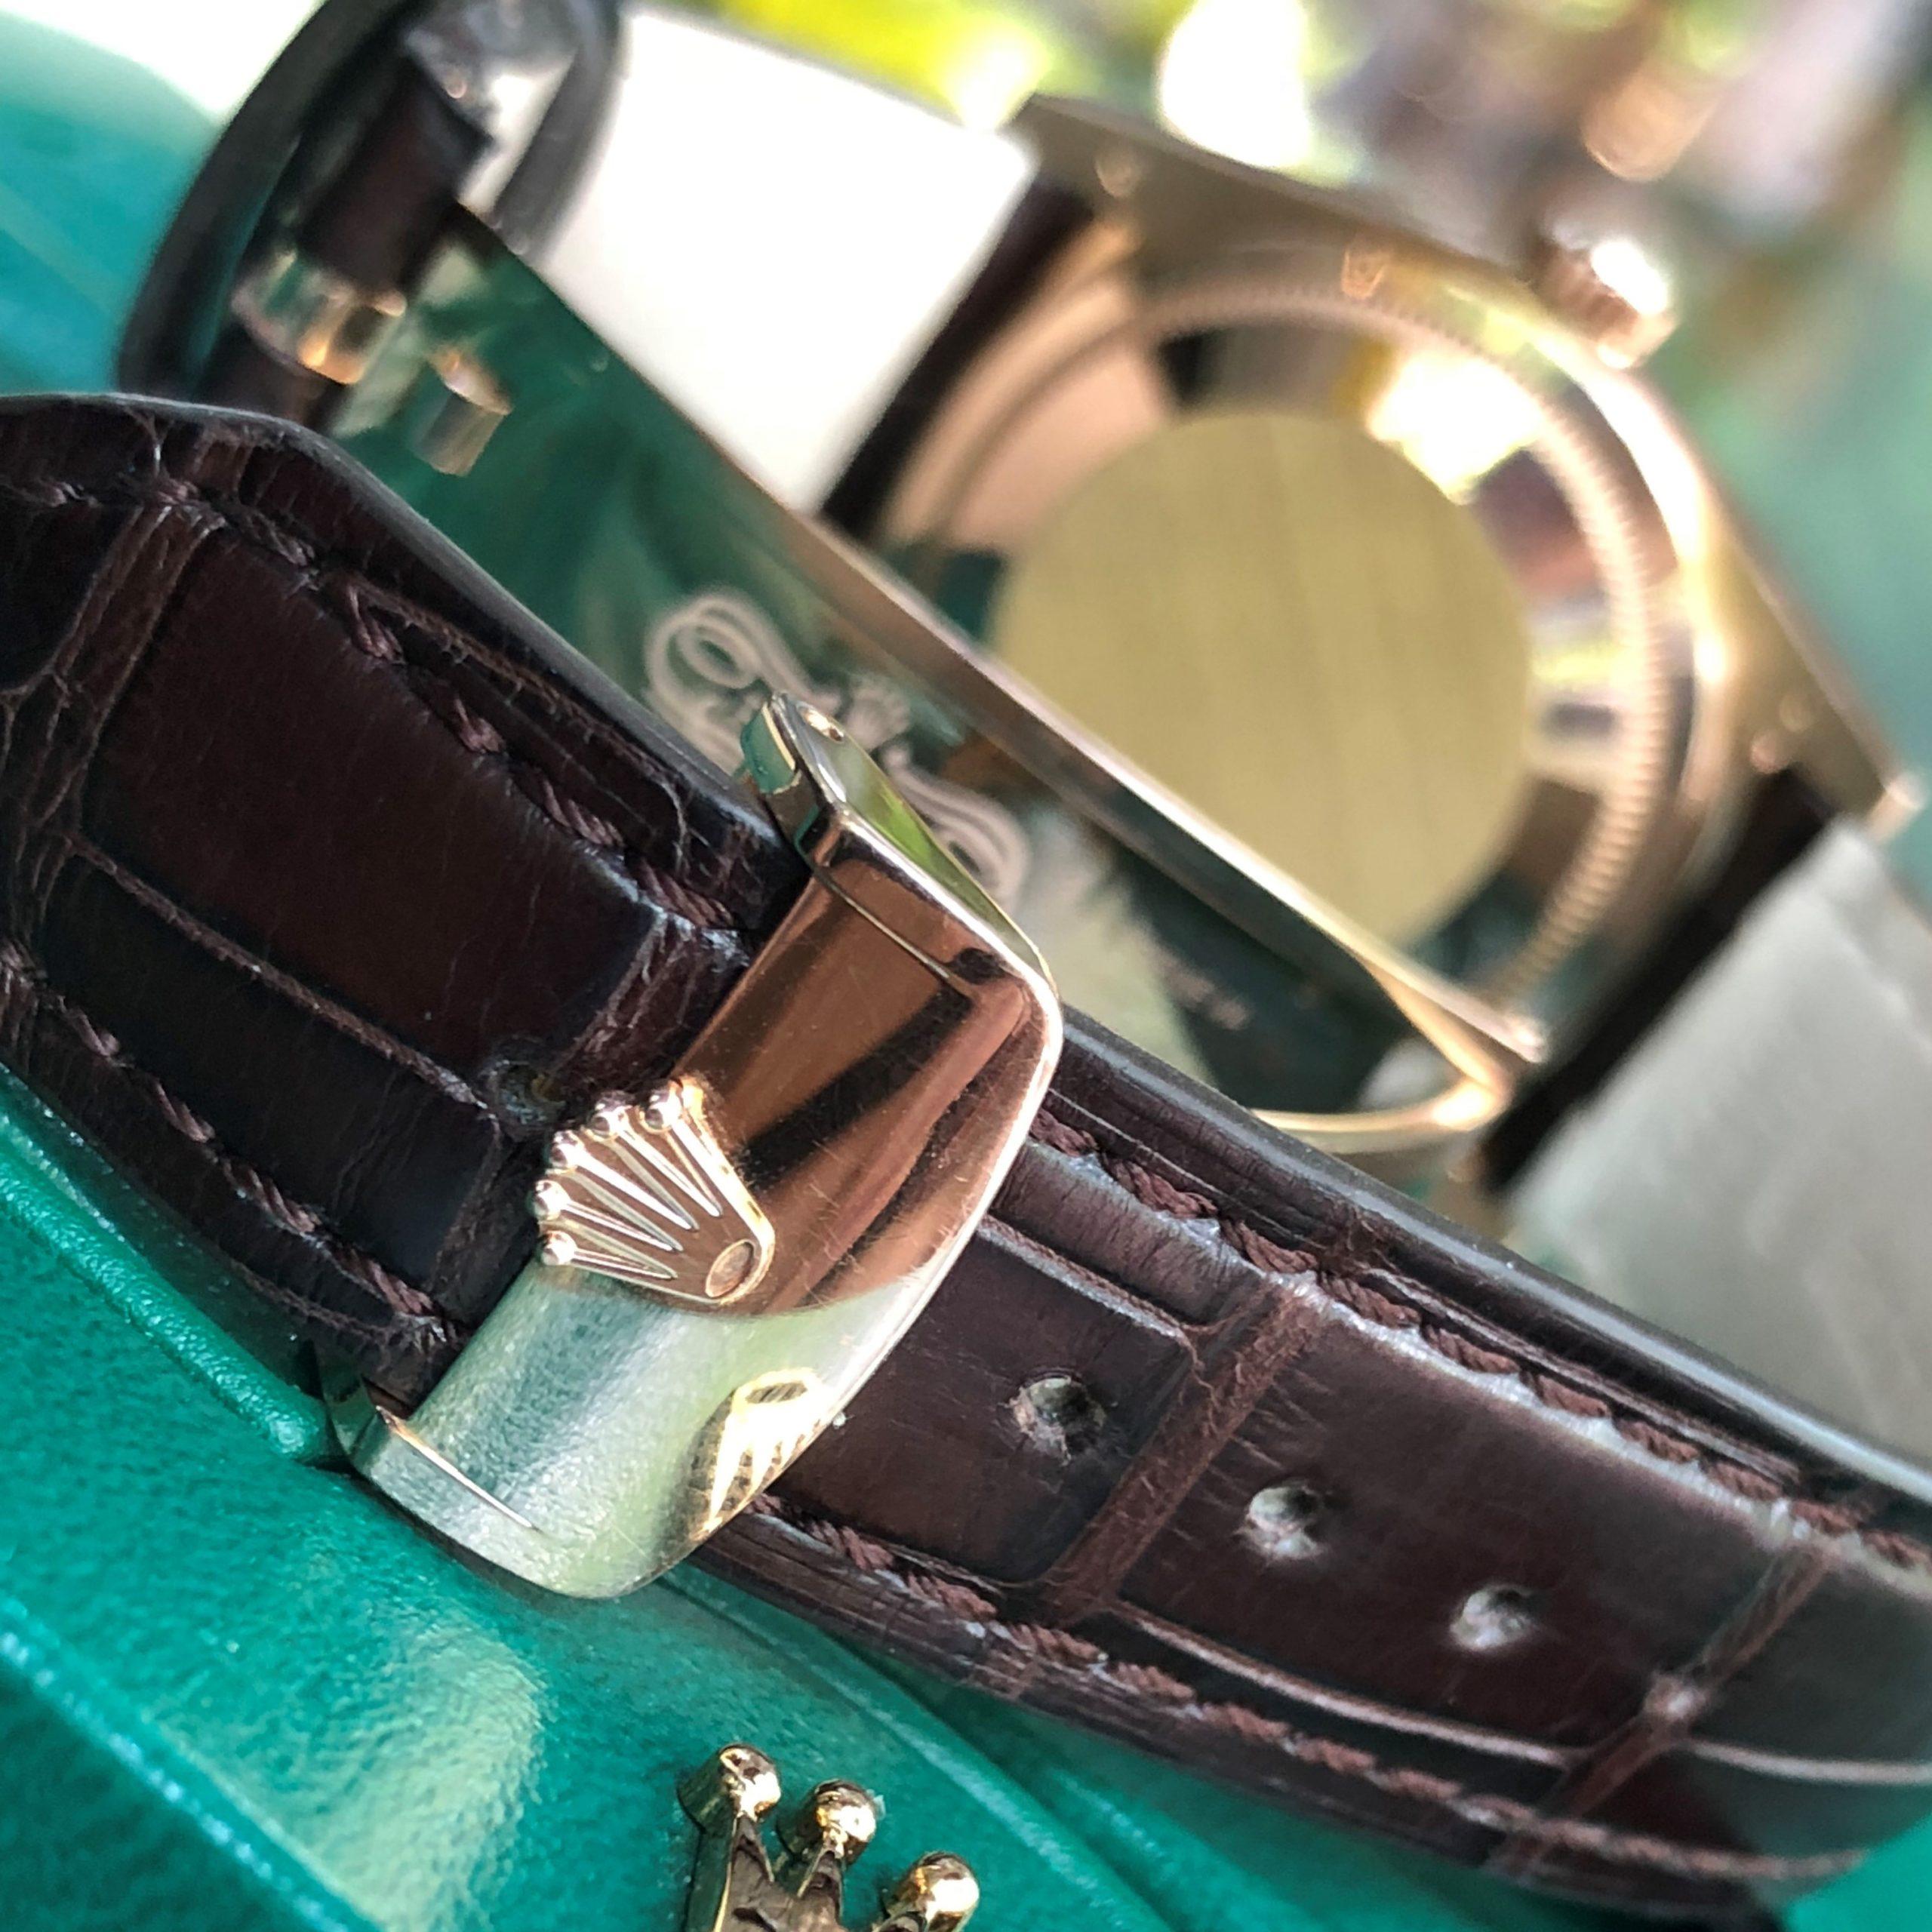 Rolex Day-Date 118135 mặt nâu vàng hồng 18k fullbox 2014